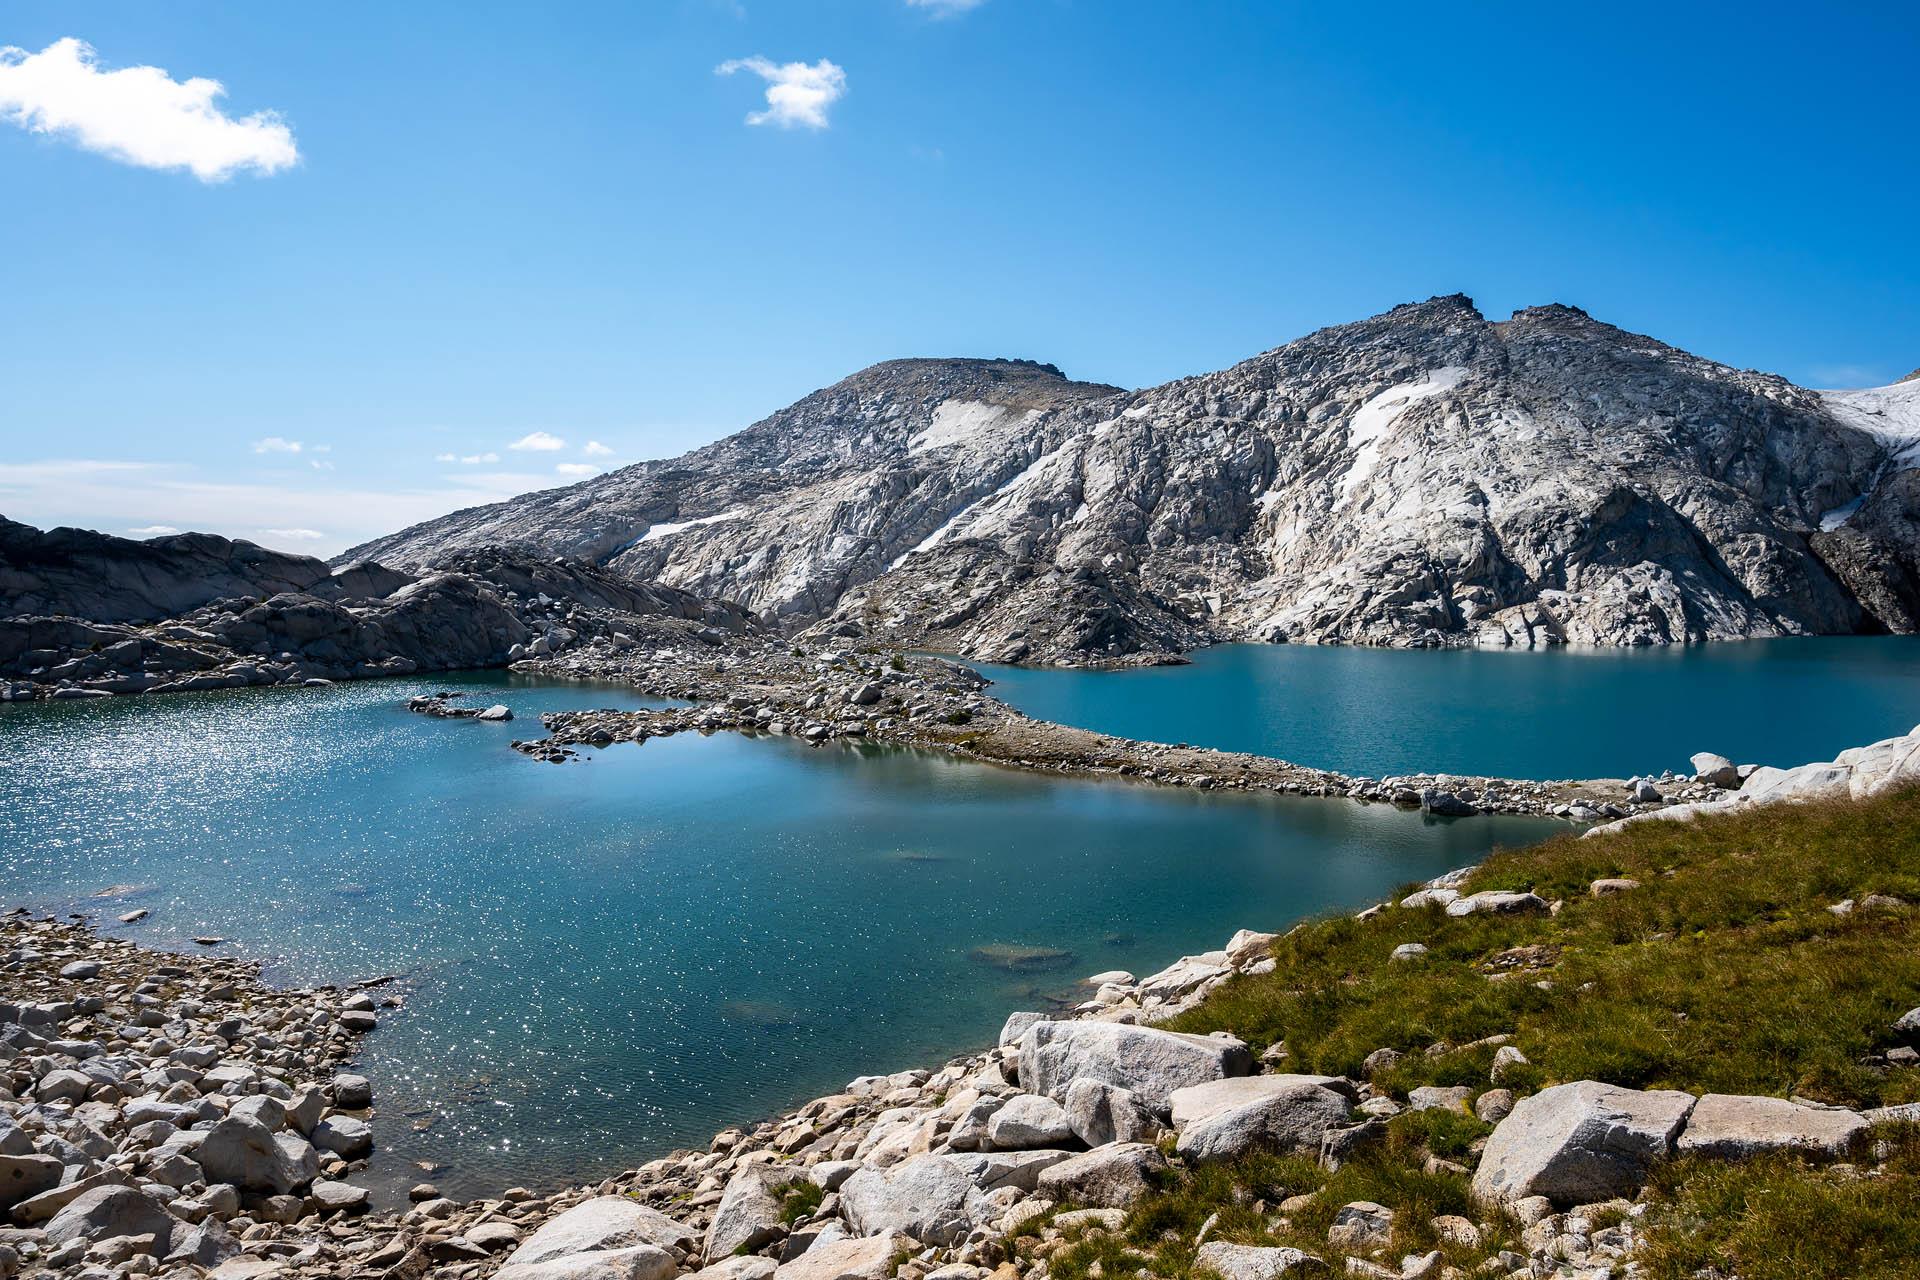 Isolation Lake & Lake Reginleif